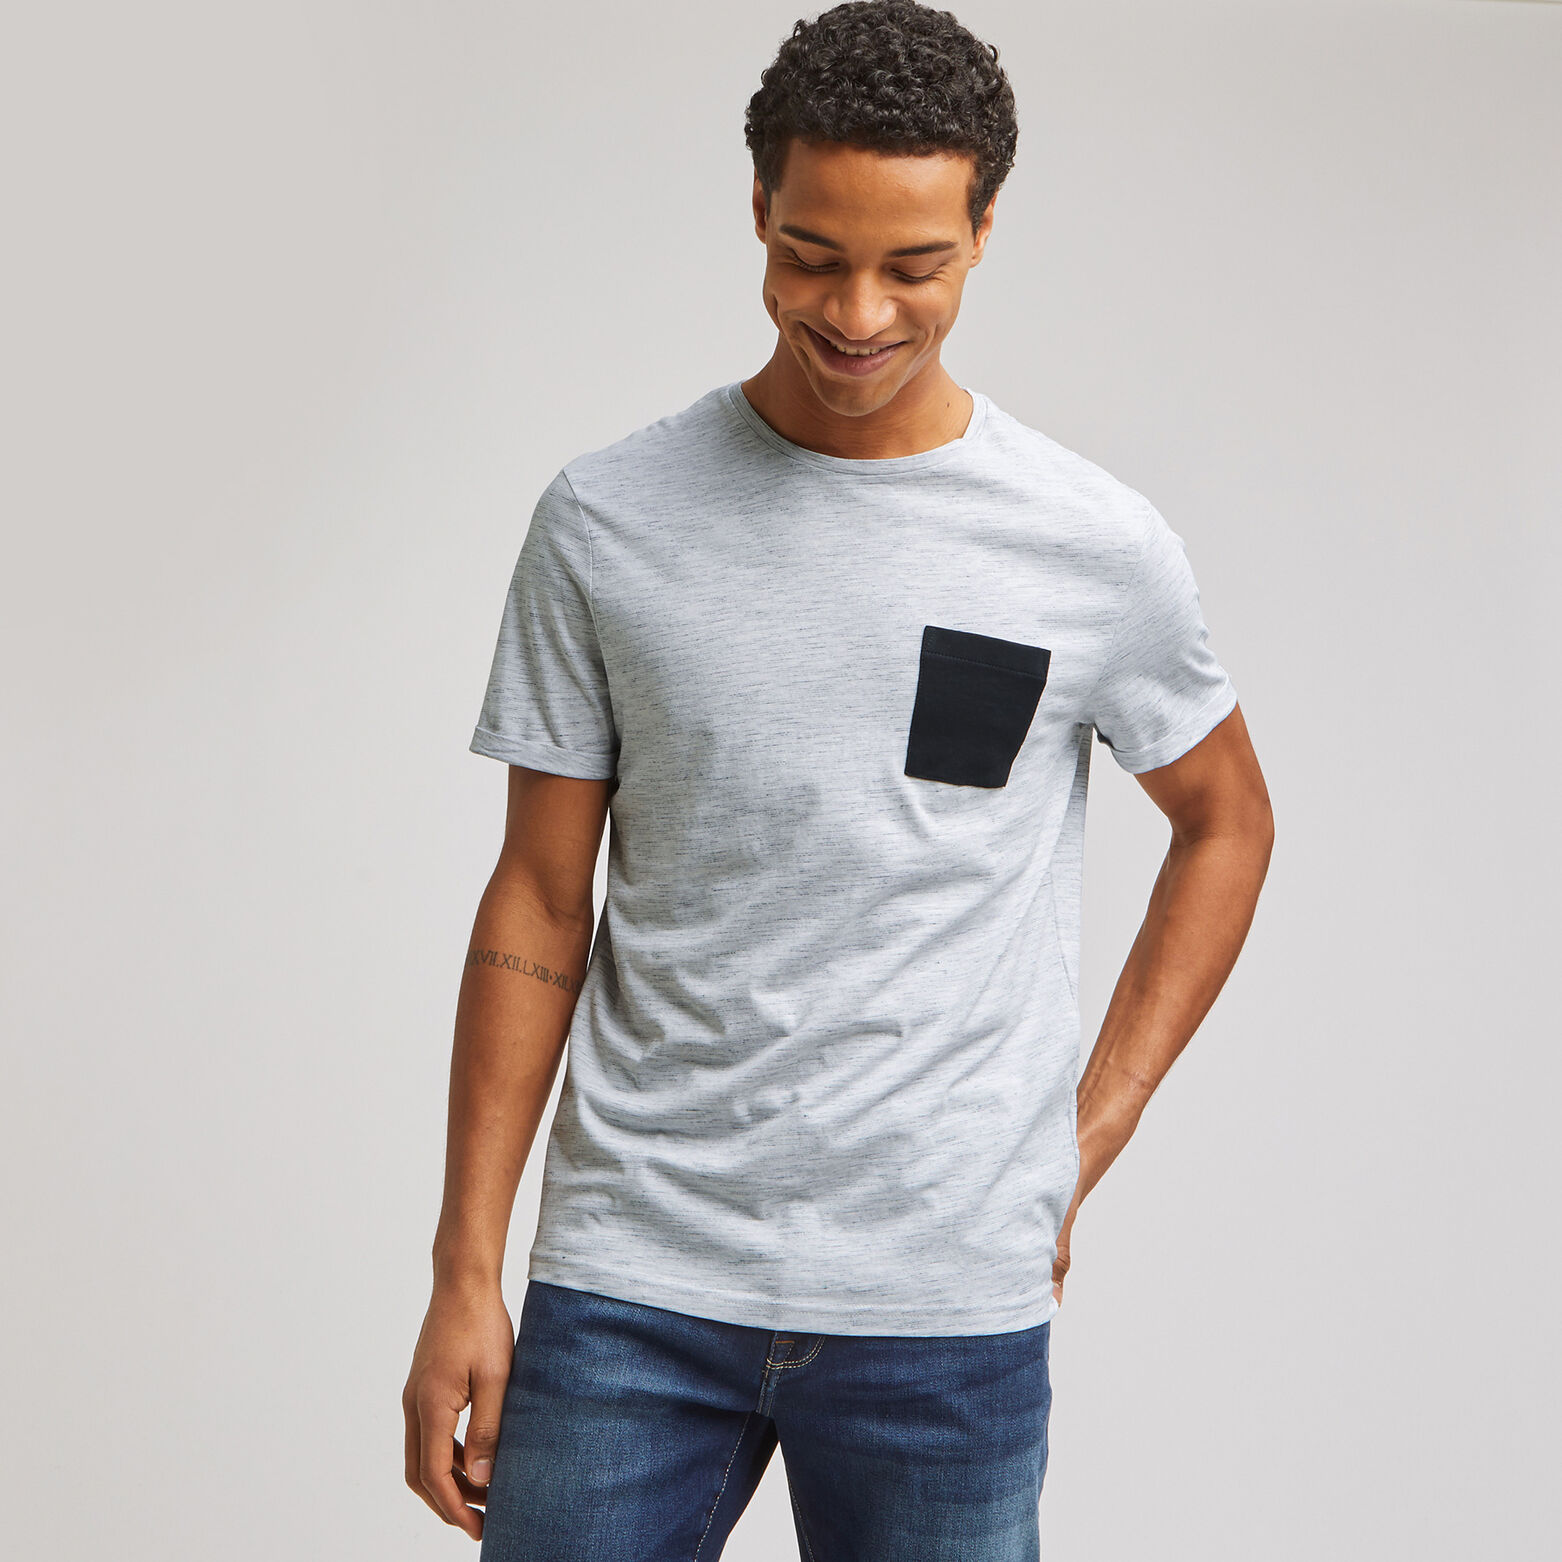 Tee-shirt matière fantaisie poche contrastée conte